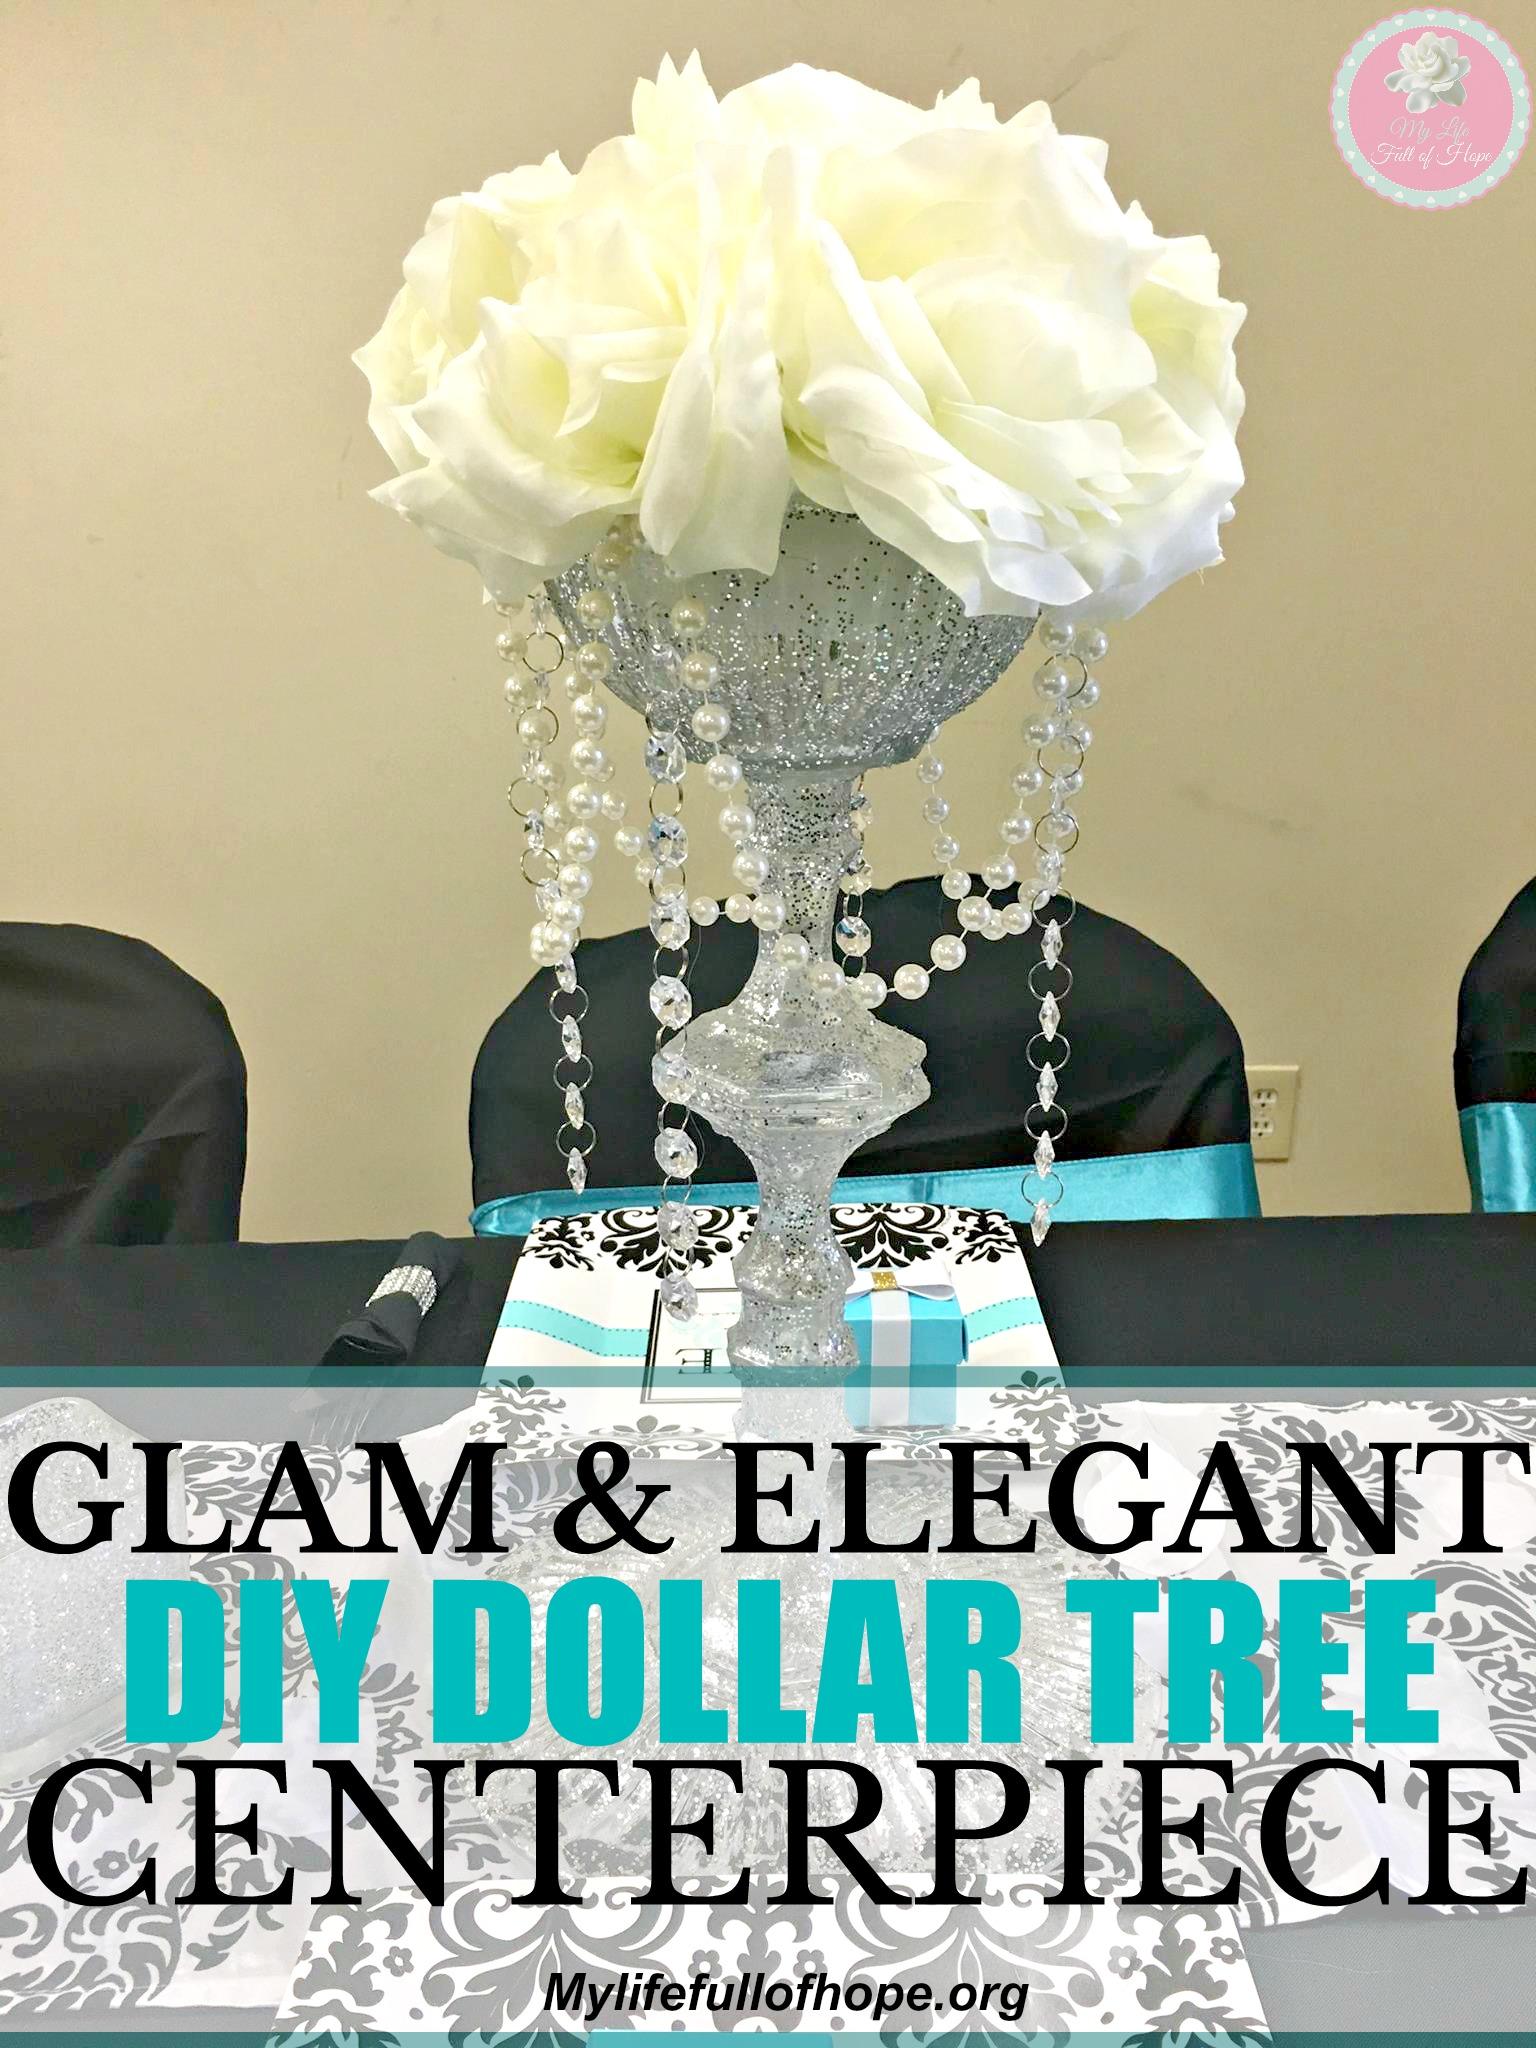 Glam Elegant Dollar Tree Centerpiece Weddings Anniversary